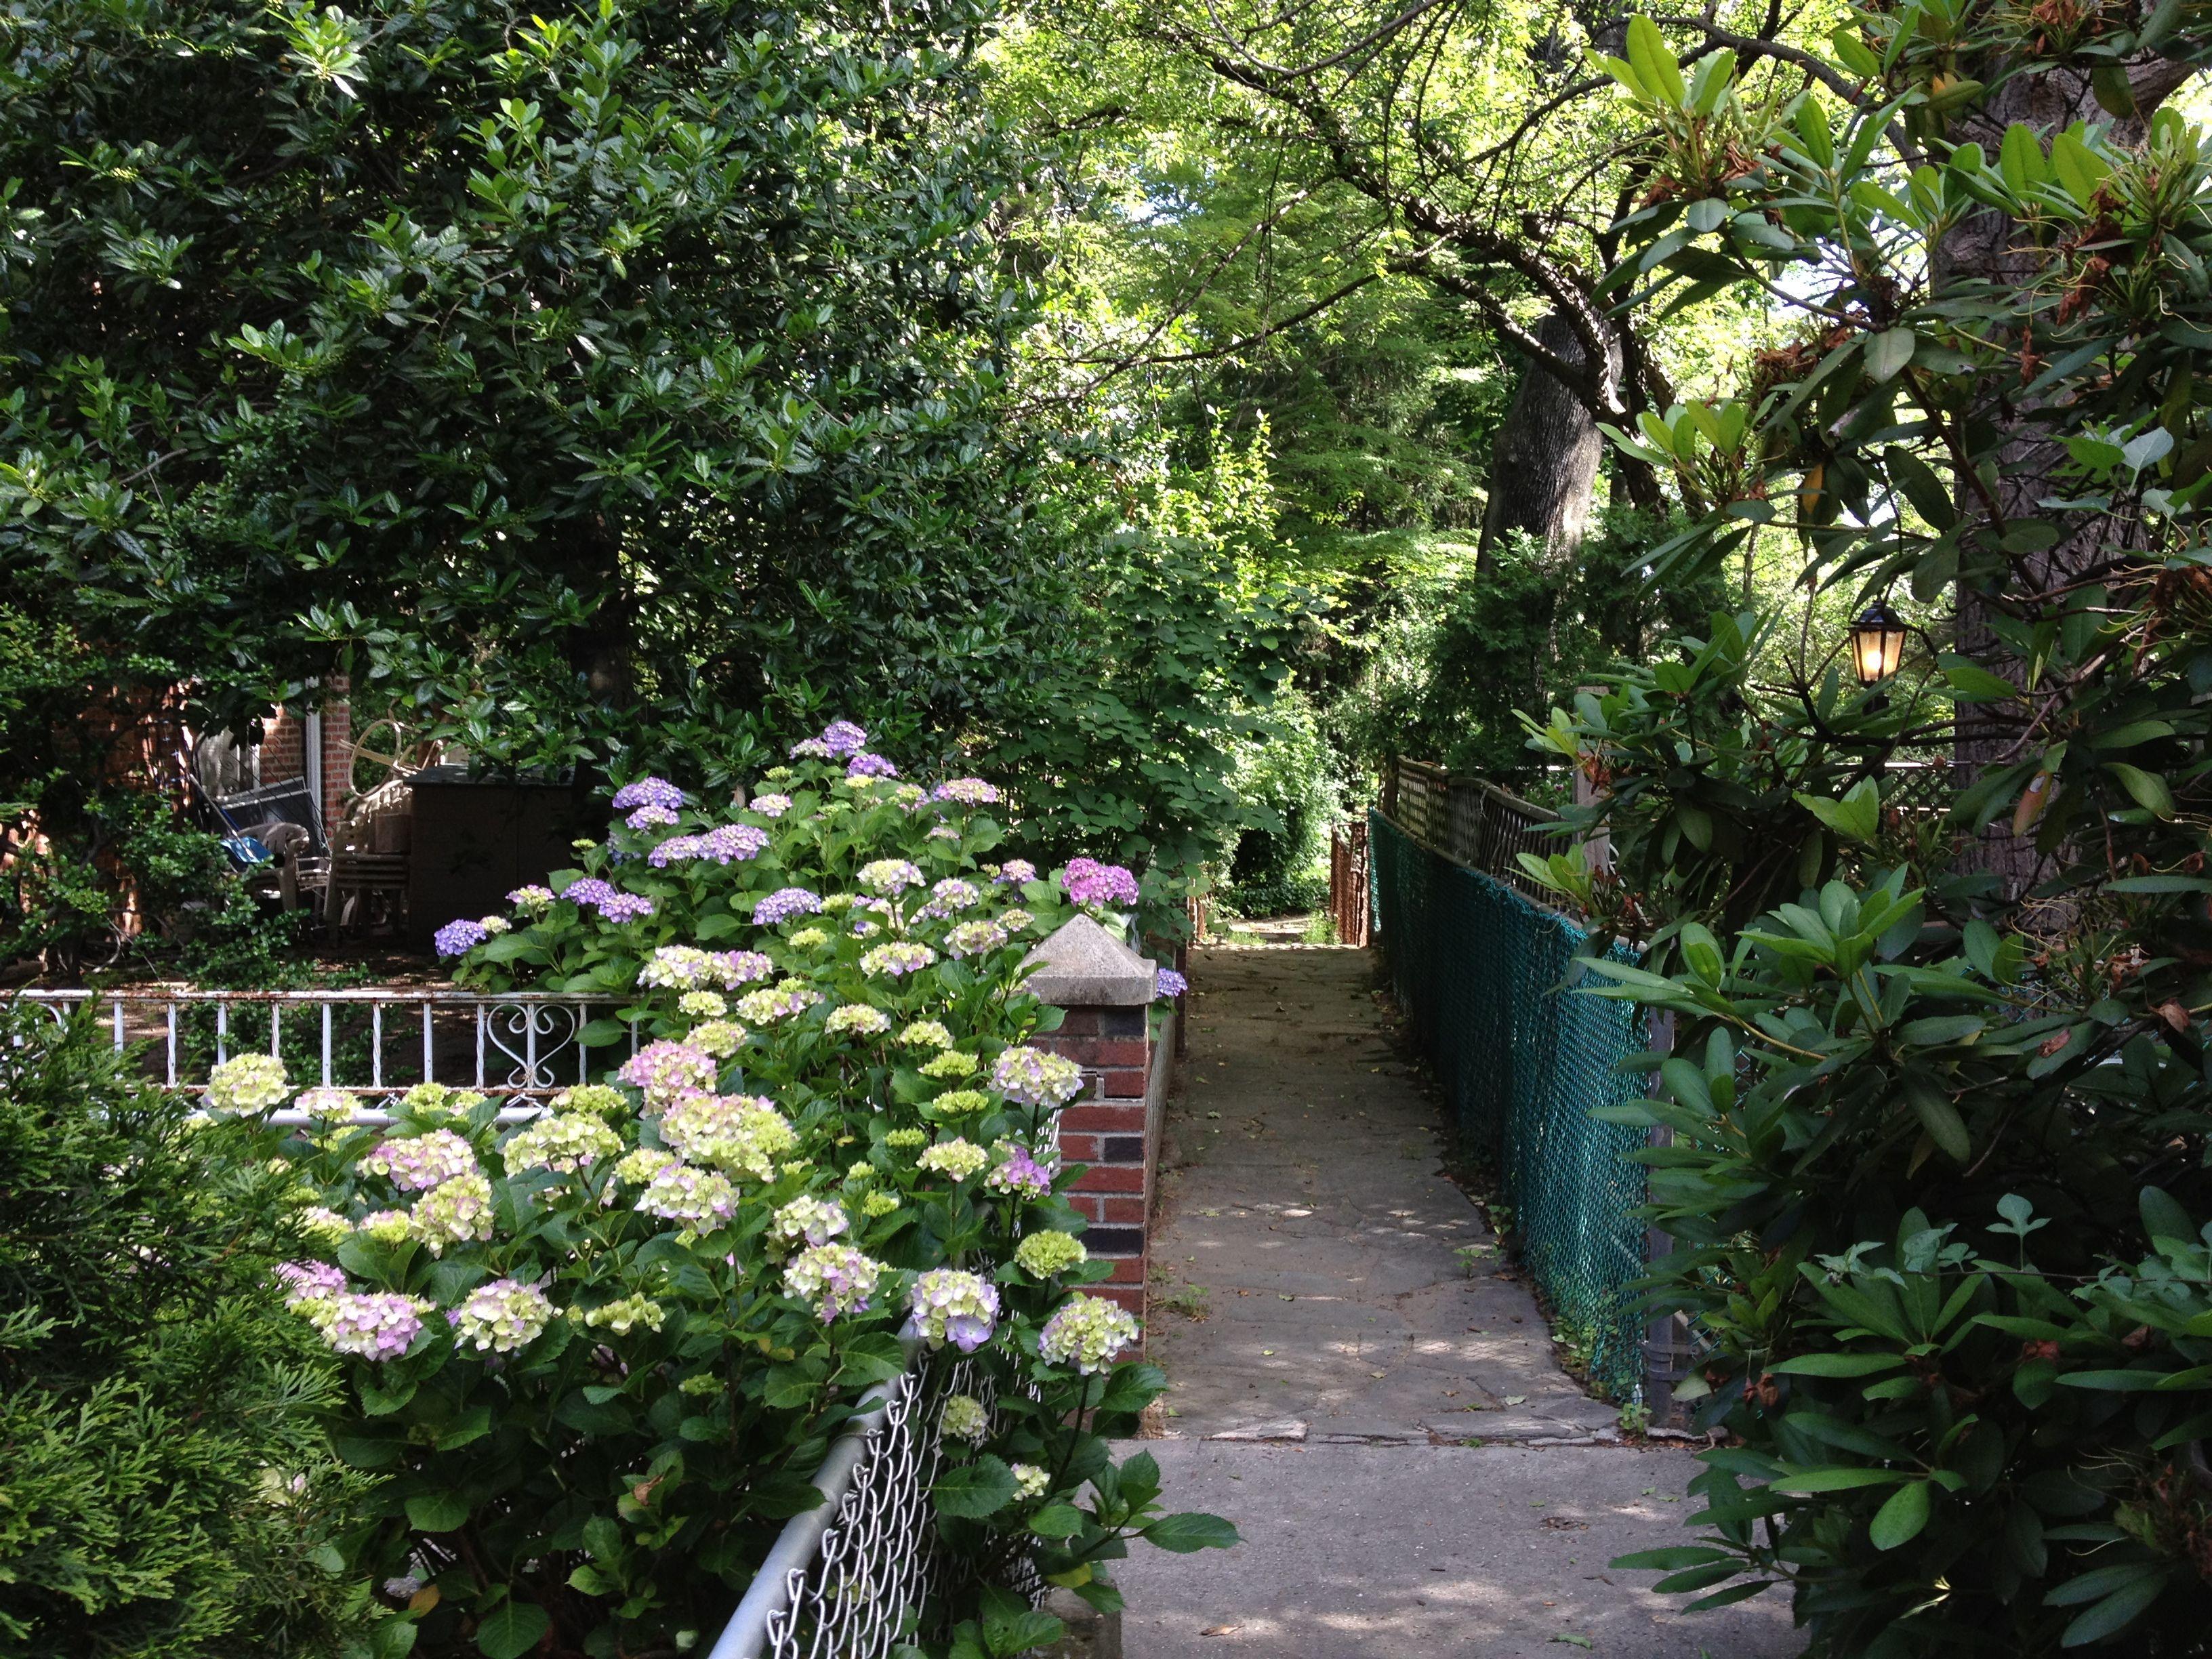 adventuresindaddyduty.files.wordpress.com 2012 06 sunnyside-gardens-alley-intersection.jpg